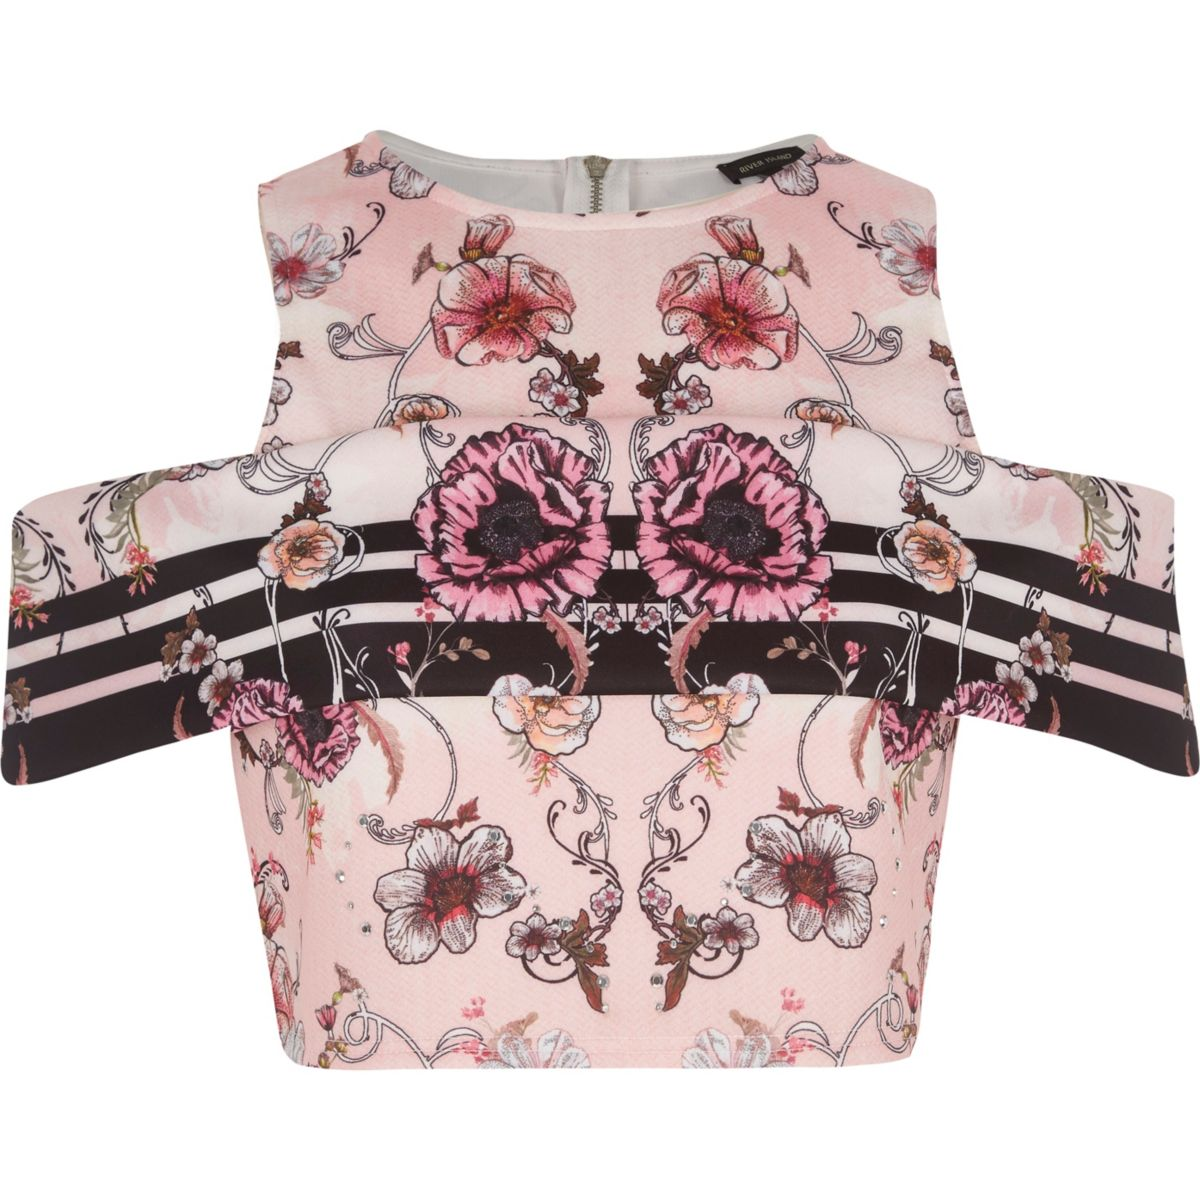 Pinkes Crop Top mit Blumenmuster